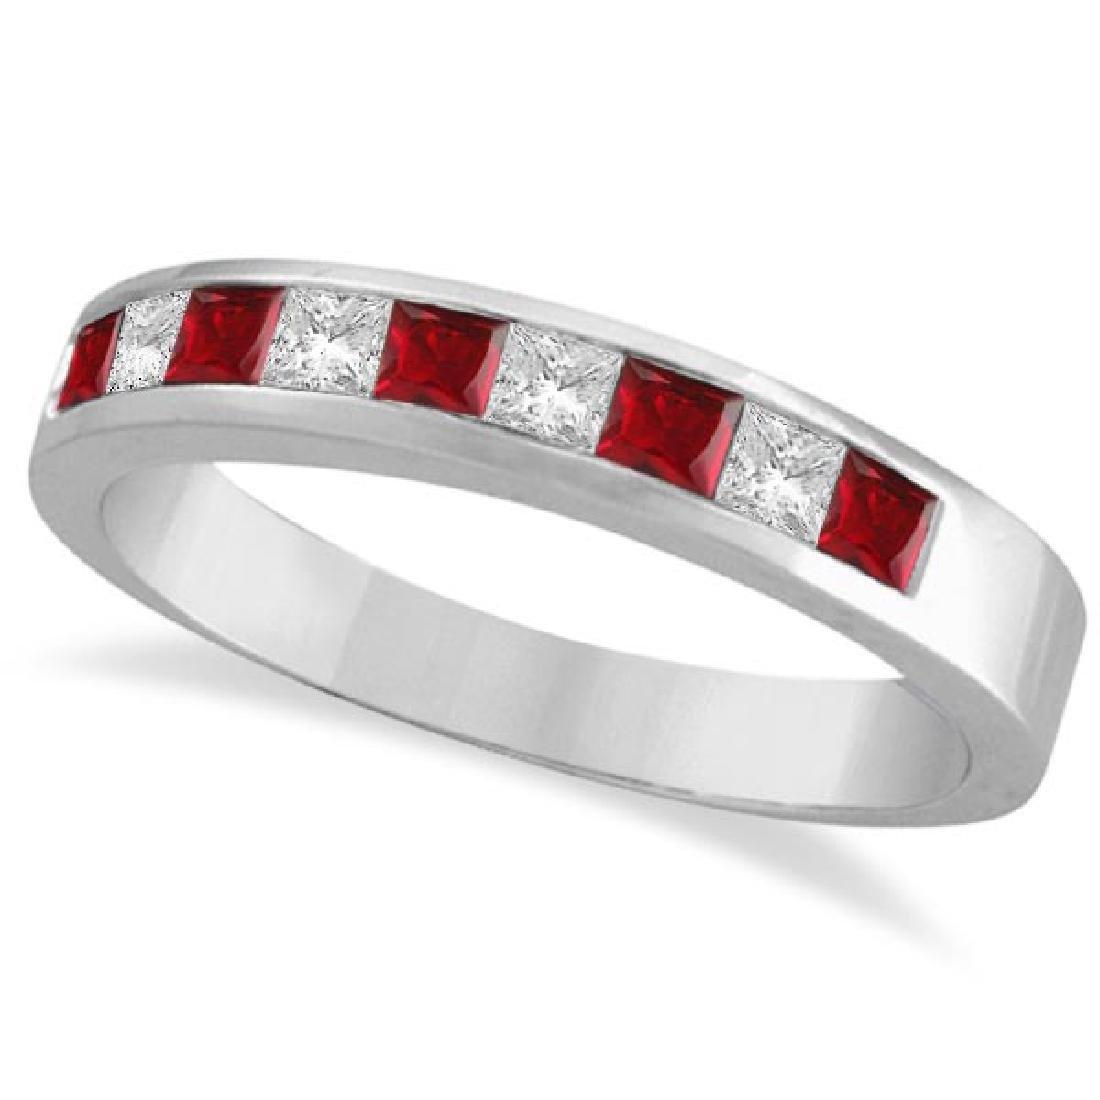 Princess-Cut Channel-Set Diamond and Ruby Ring Band 14k